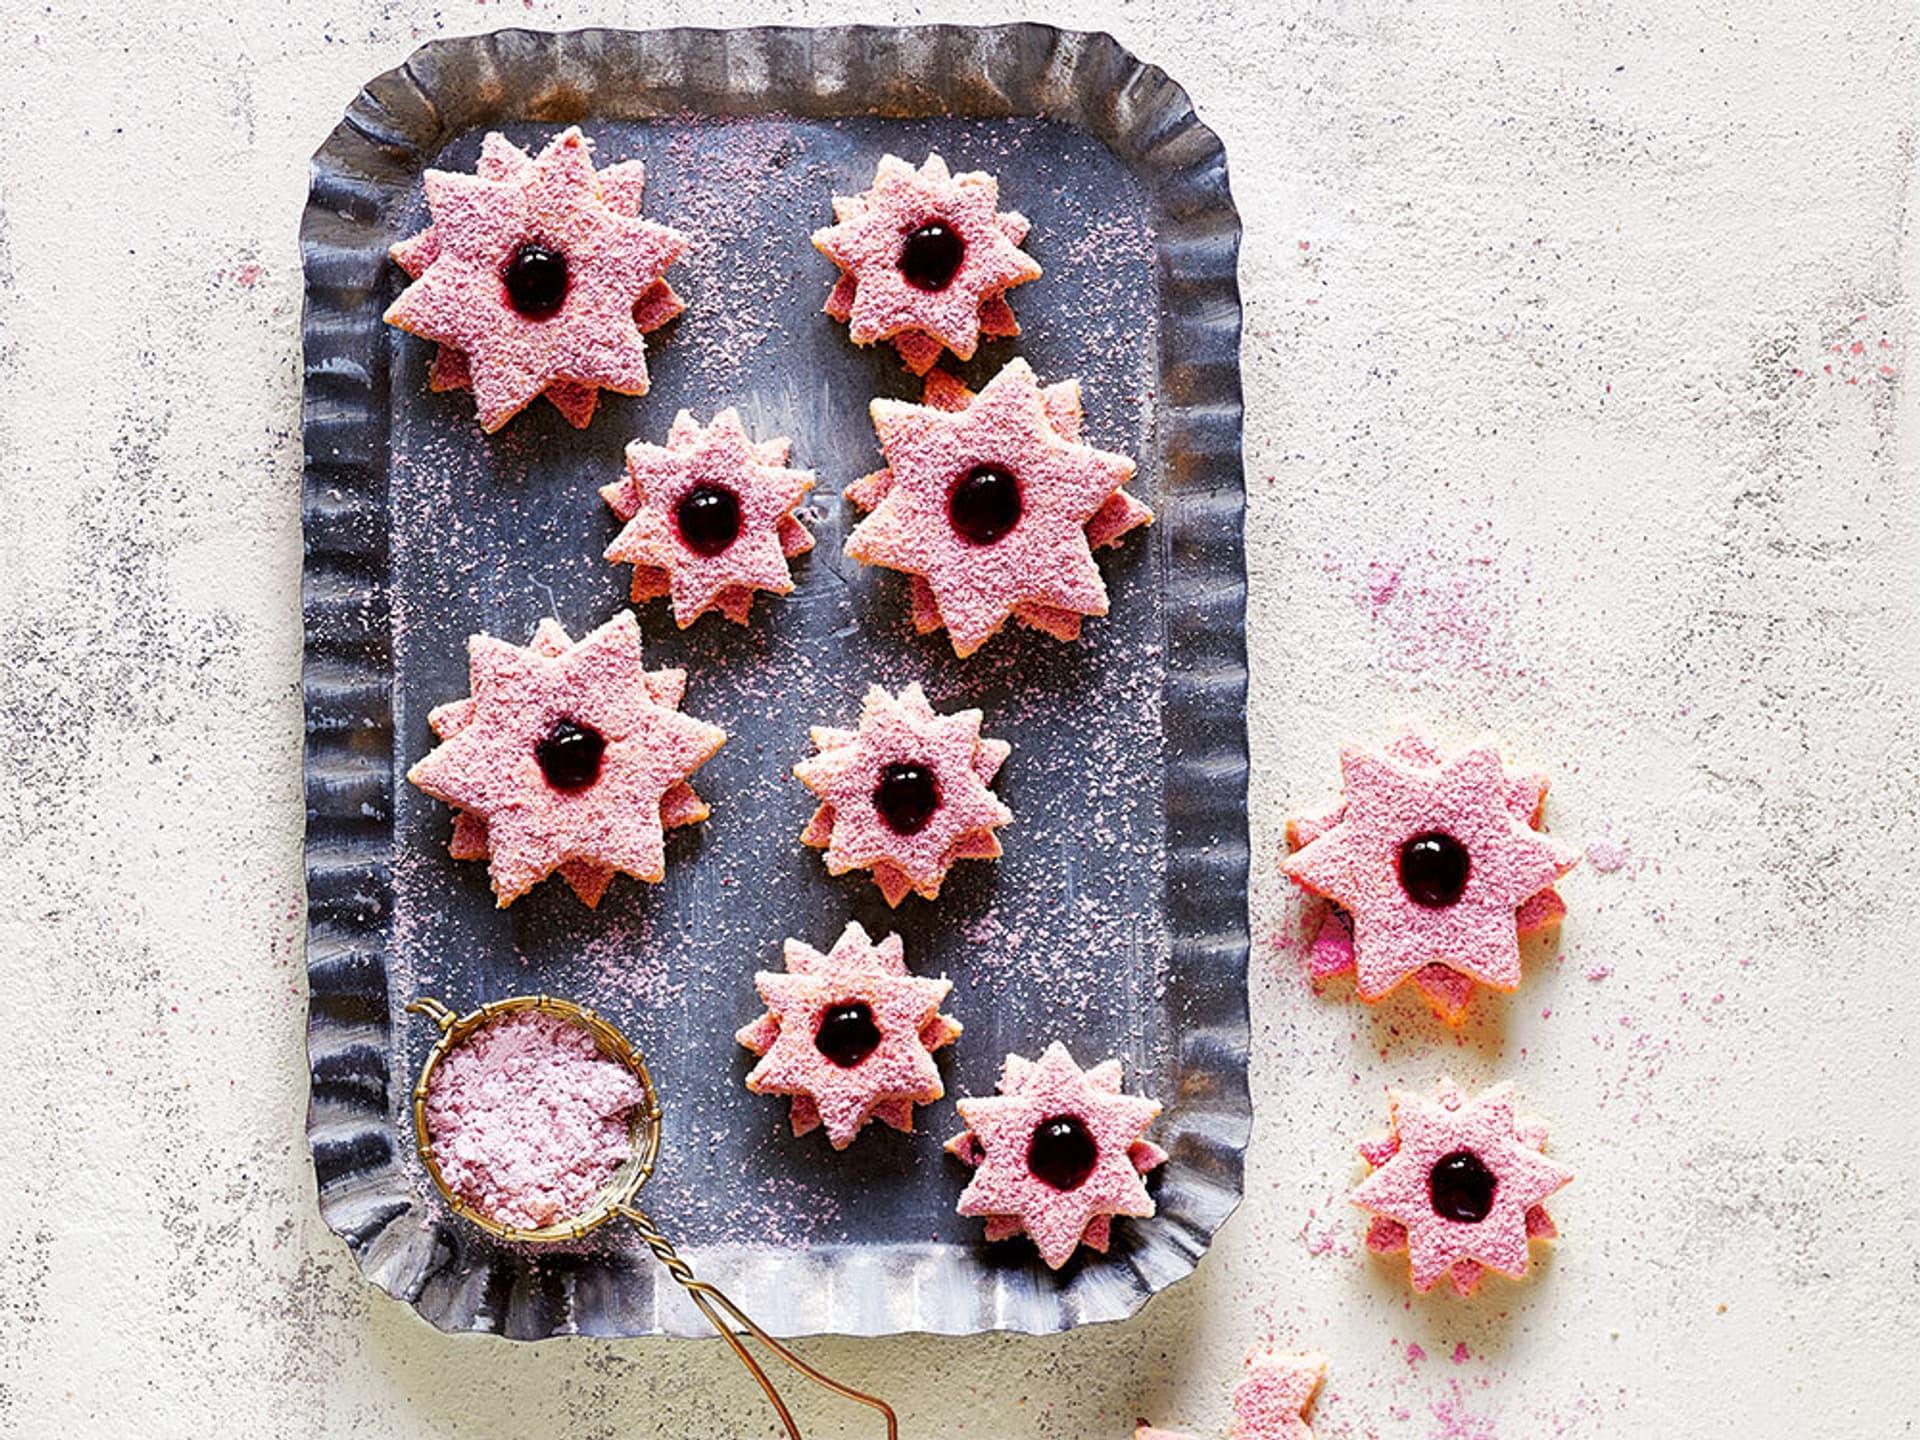 Himbeer-Sterne mit Kokos